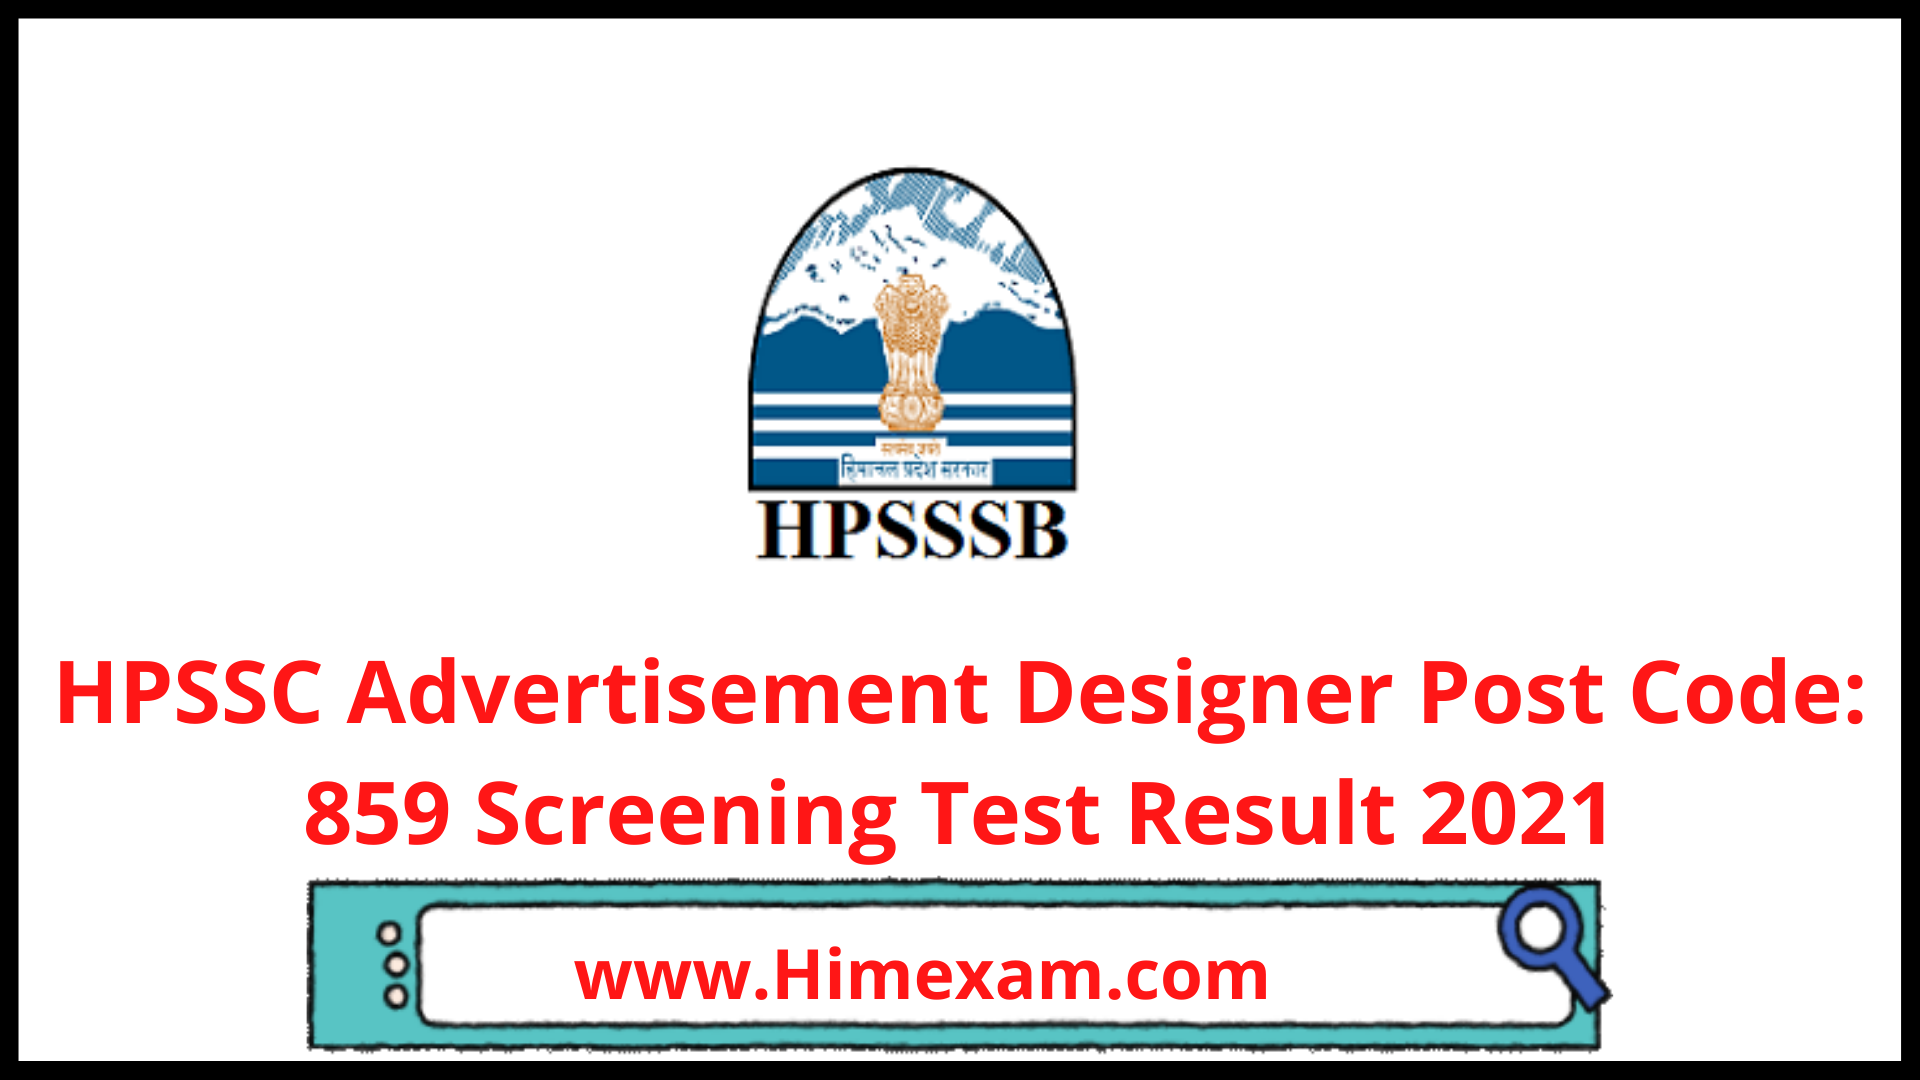 HPSSC Advertisement Designer Post Code: 859 Screening Test Result 2021